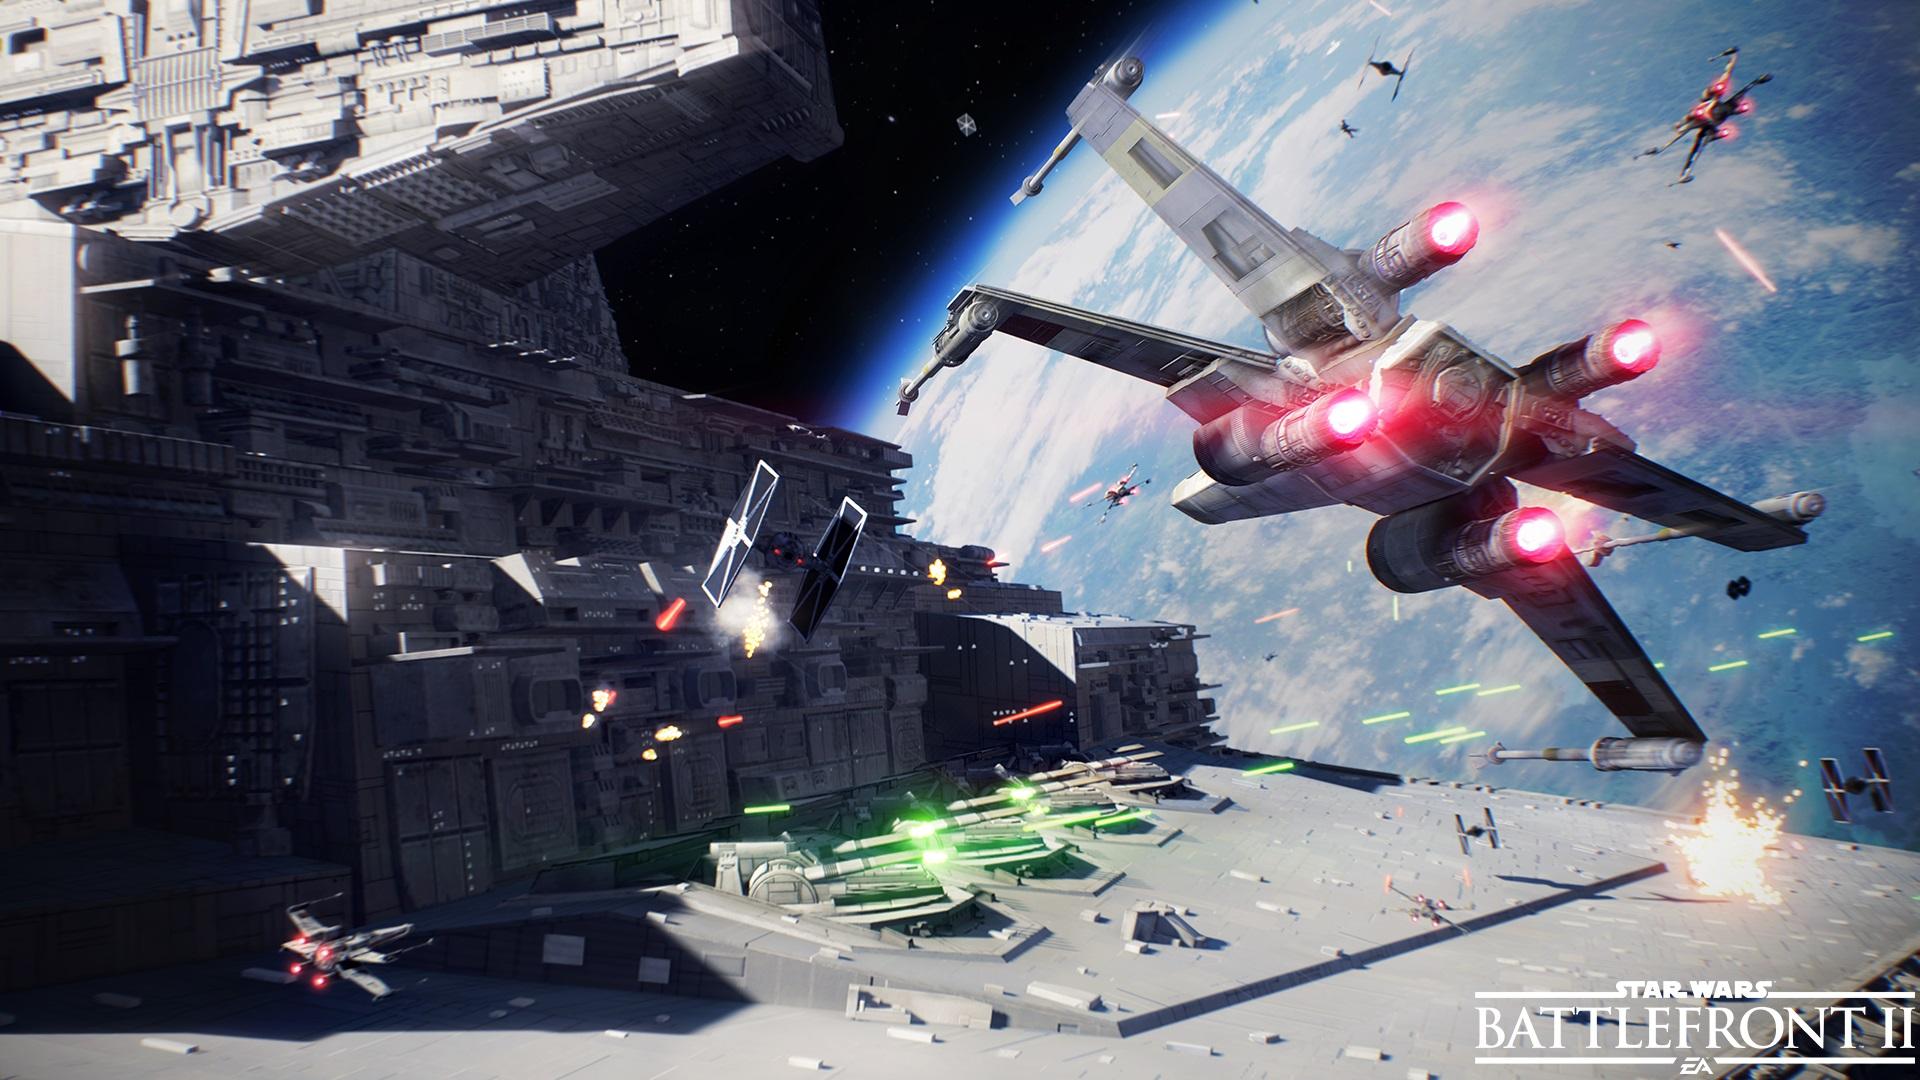 La pre-alpha de Star Wars: Battlefront 2 corre a 1080p @ 60 FPS en ...